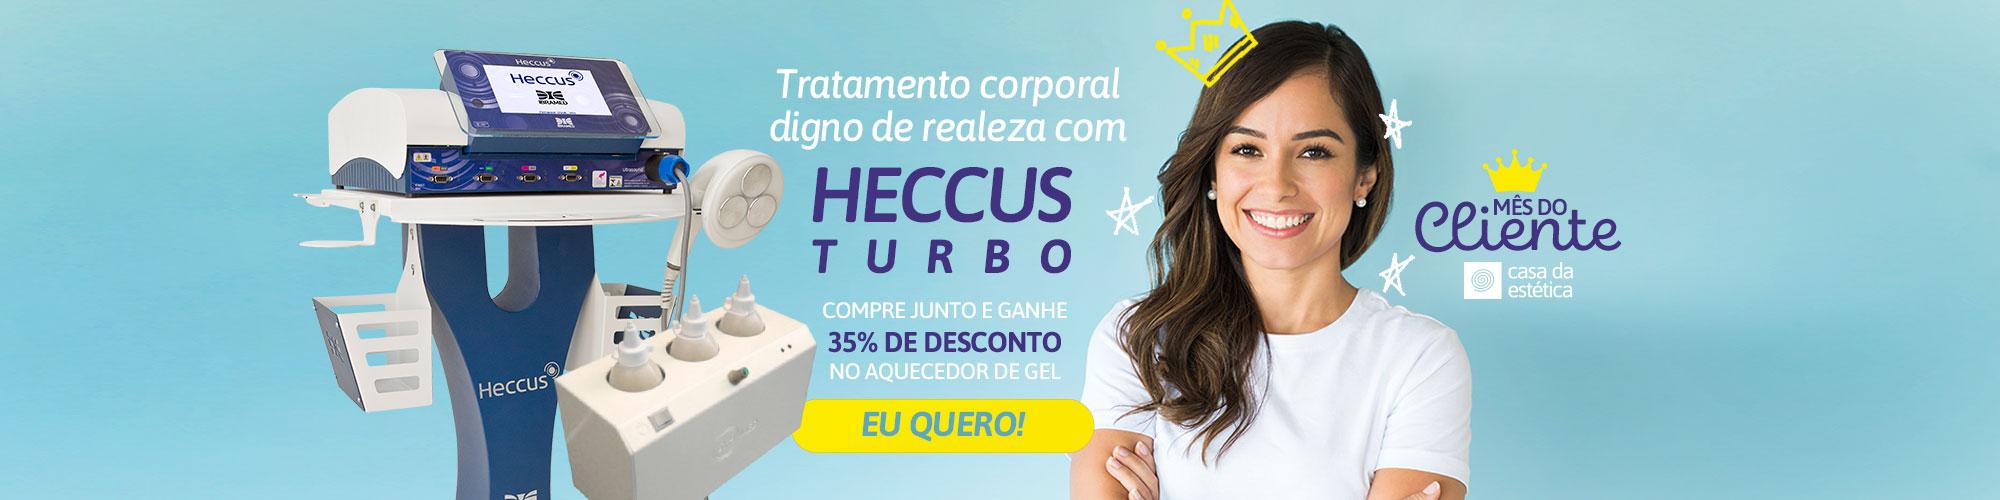 HECCUS TURBO